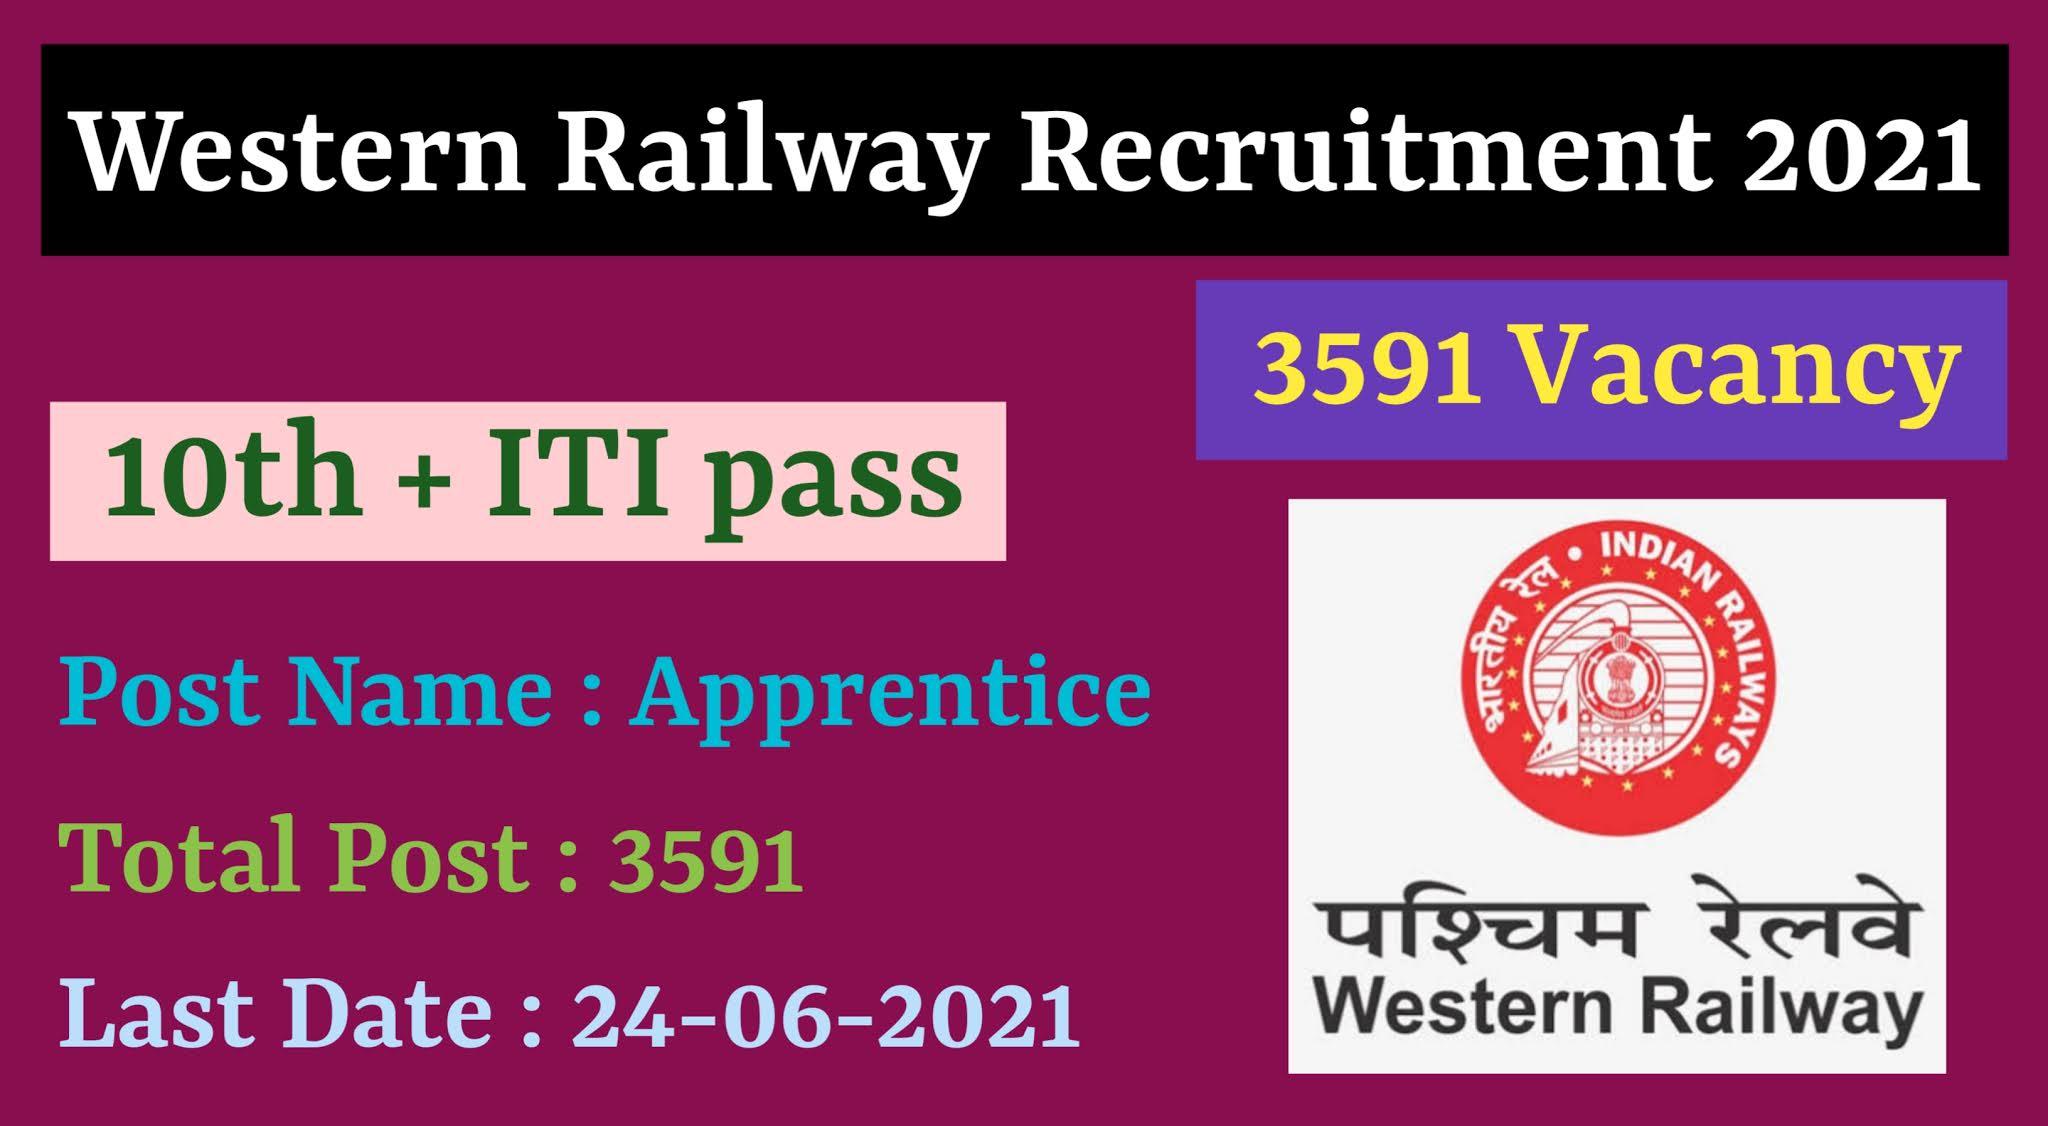 RRC Western Railway Recruitment 3591 Apprentices post 2021 | RRC Western Railway Recruitment 2021 | Apply Online Western Railway 3591 Apprentices post | Western Railway Apprentice Recruitment 2021 | Advt. No : RRC/WR/01/2021